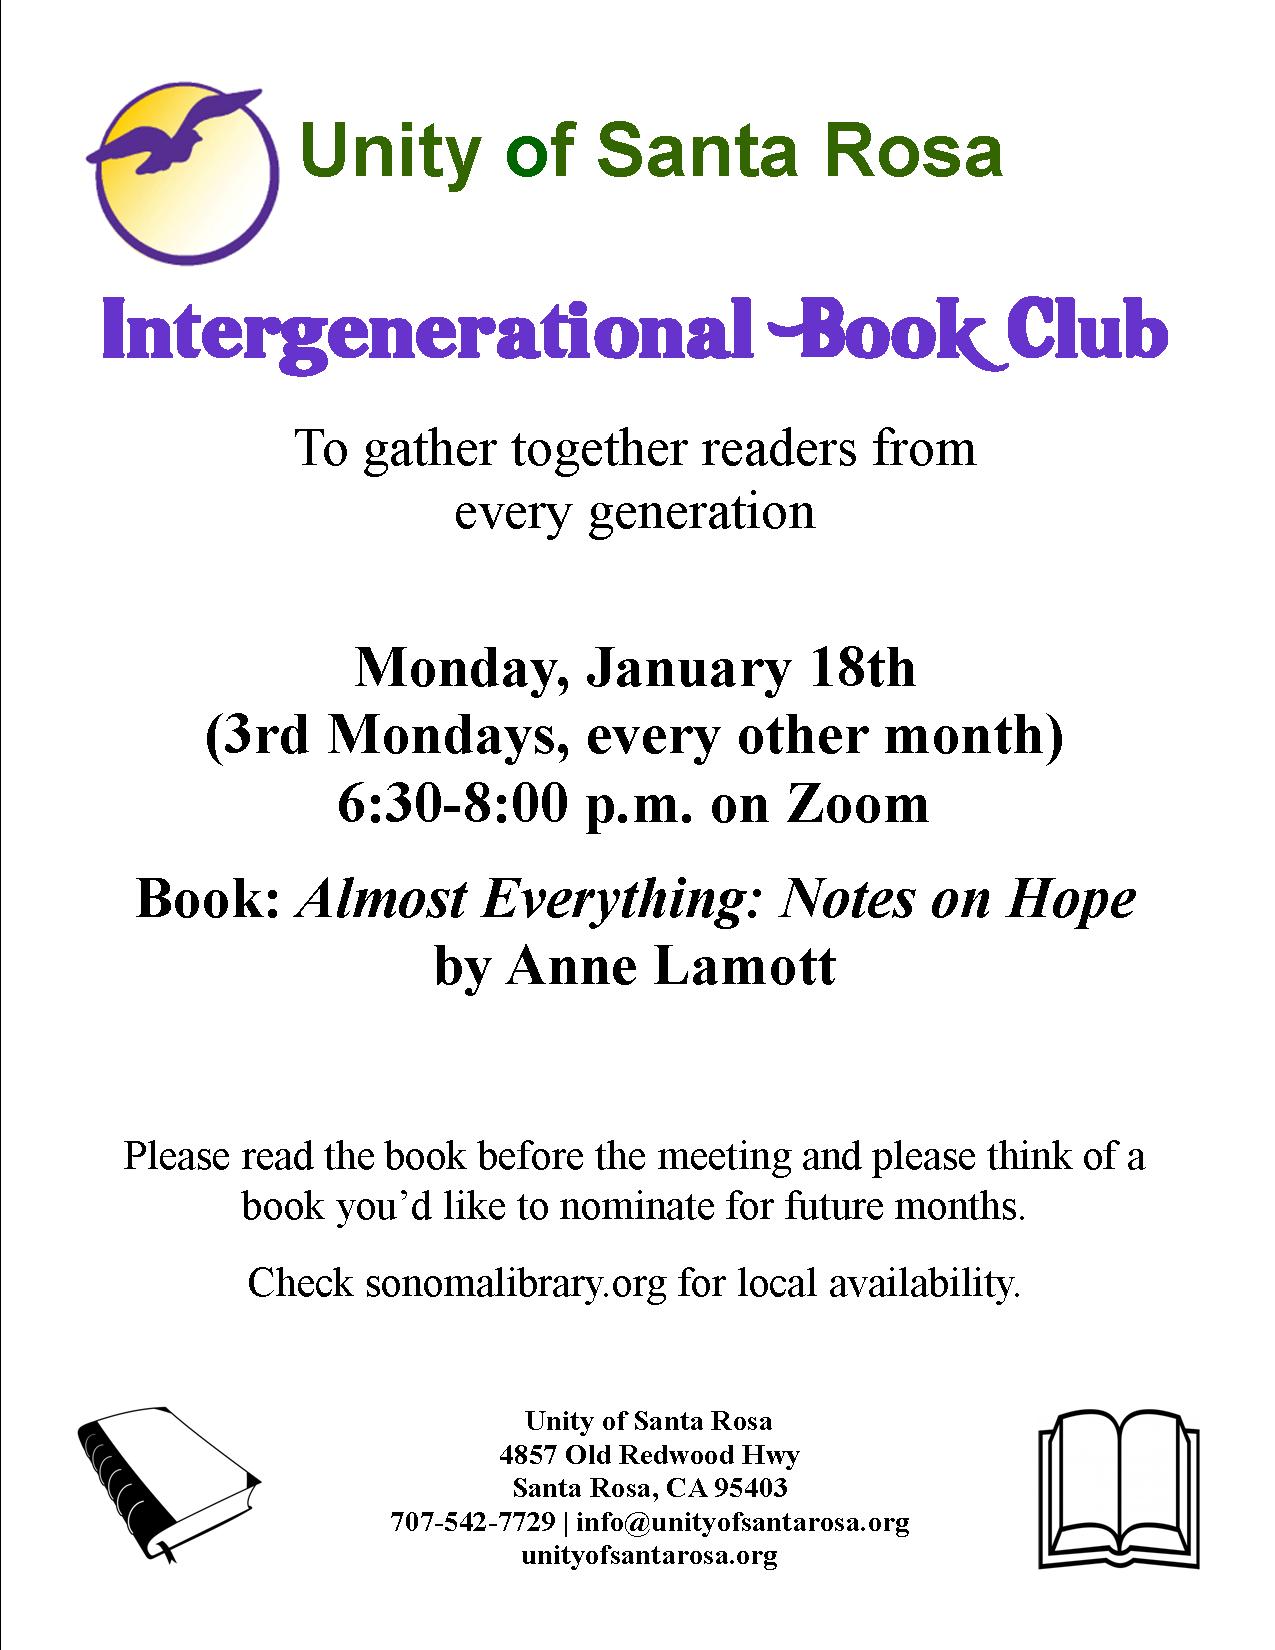 intergenerationalbookclub20201117